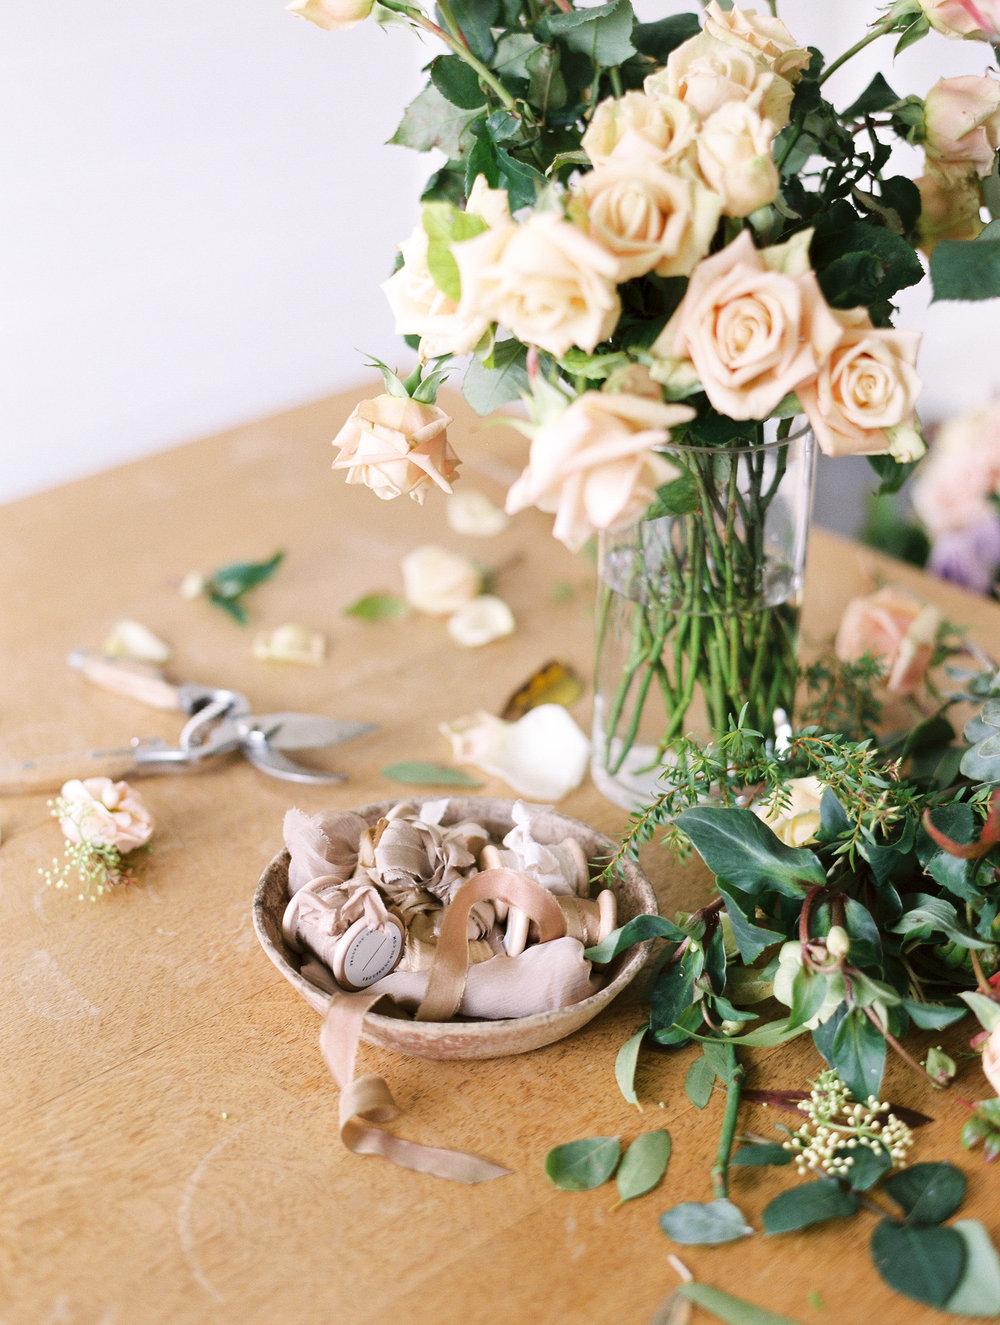 sandra-chau-stylist-floral-florist-branding-lifestyle-shoot-we-are-origami170.jpg